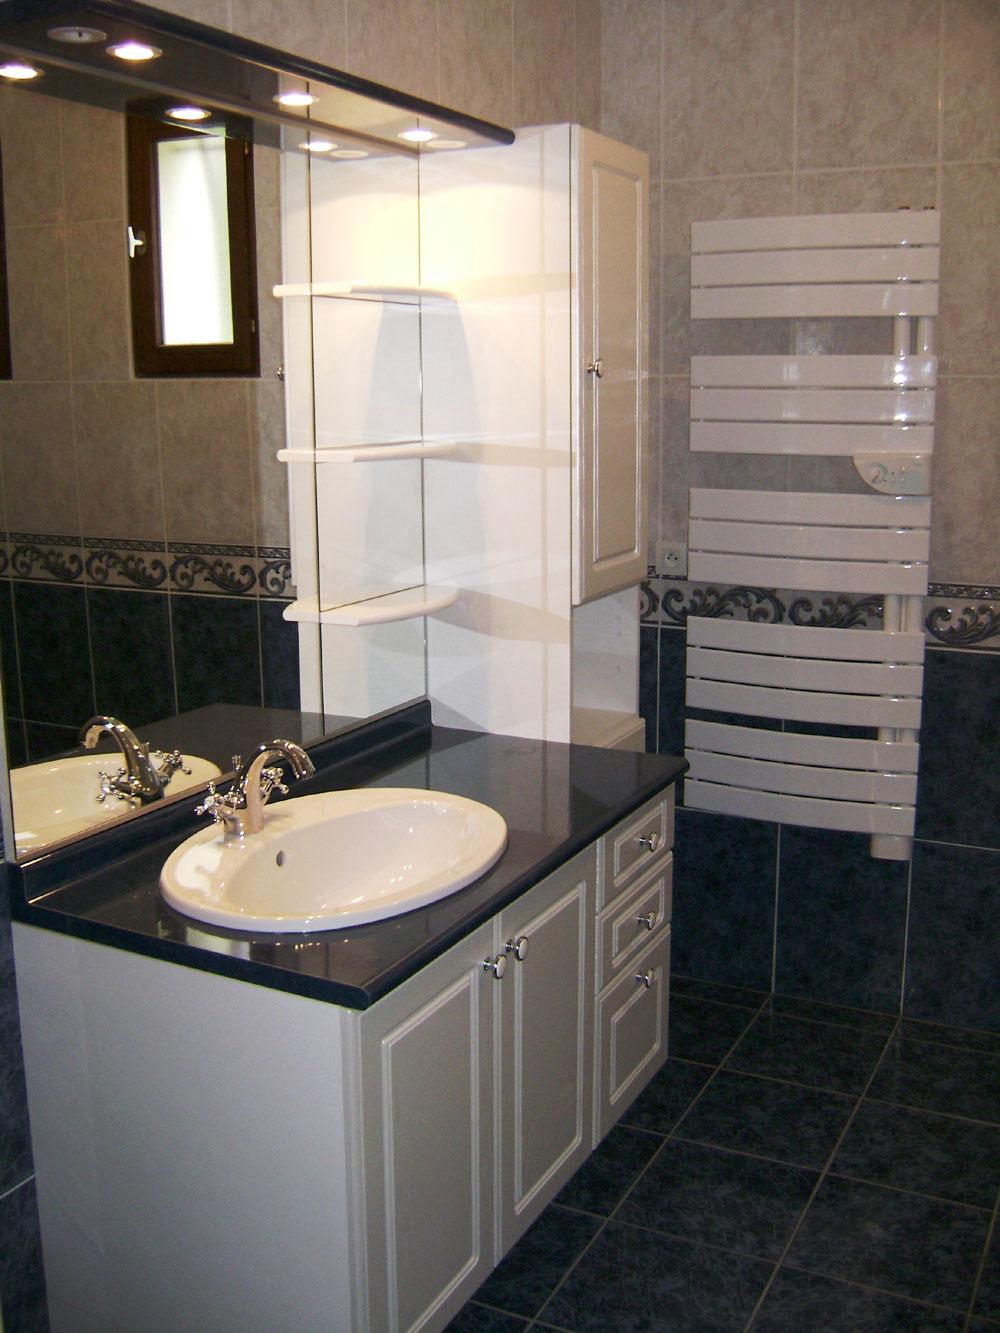 vitre salle de bain fashion designs. Black Bedroom Furniture Sets. Home Design Ideas